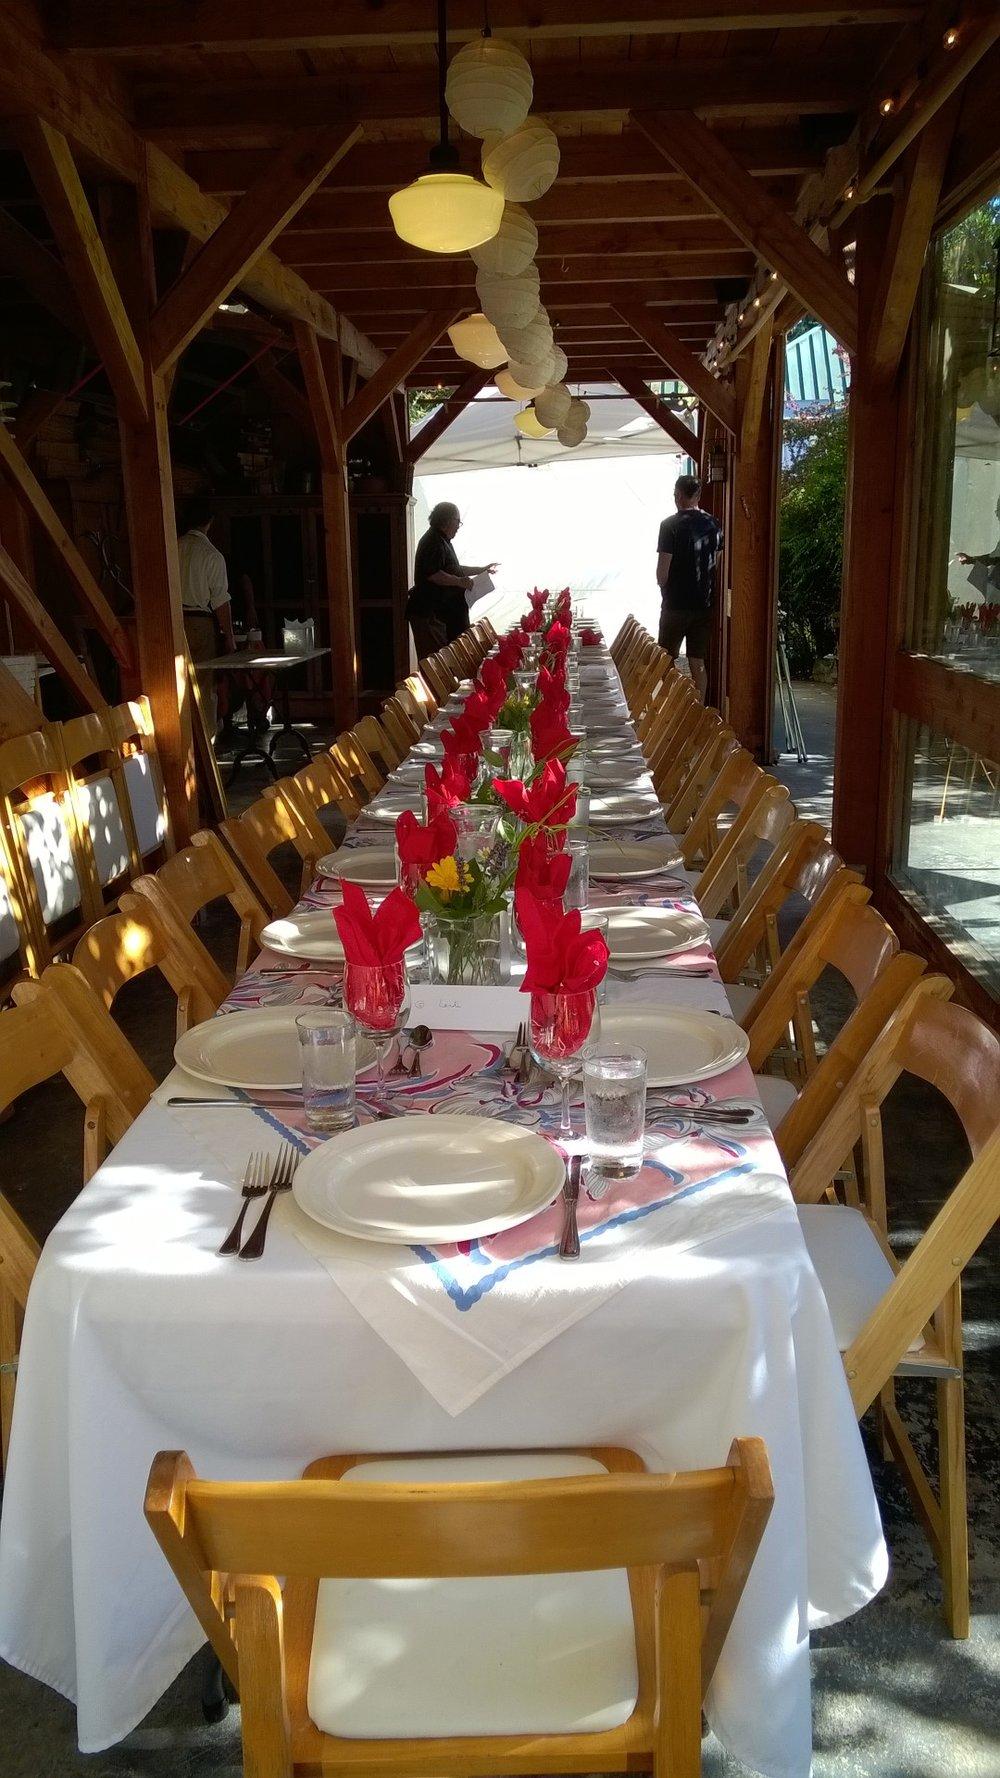 Red Rabbit Farm Dinner, Orcas Island, WA